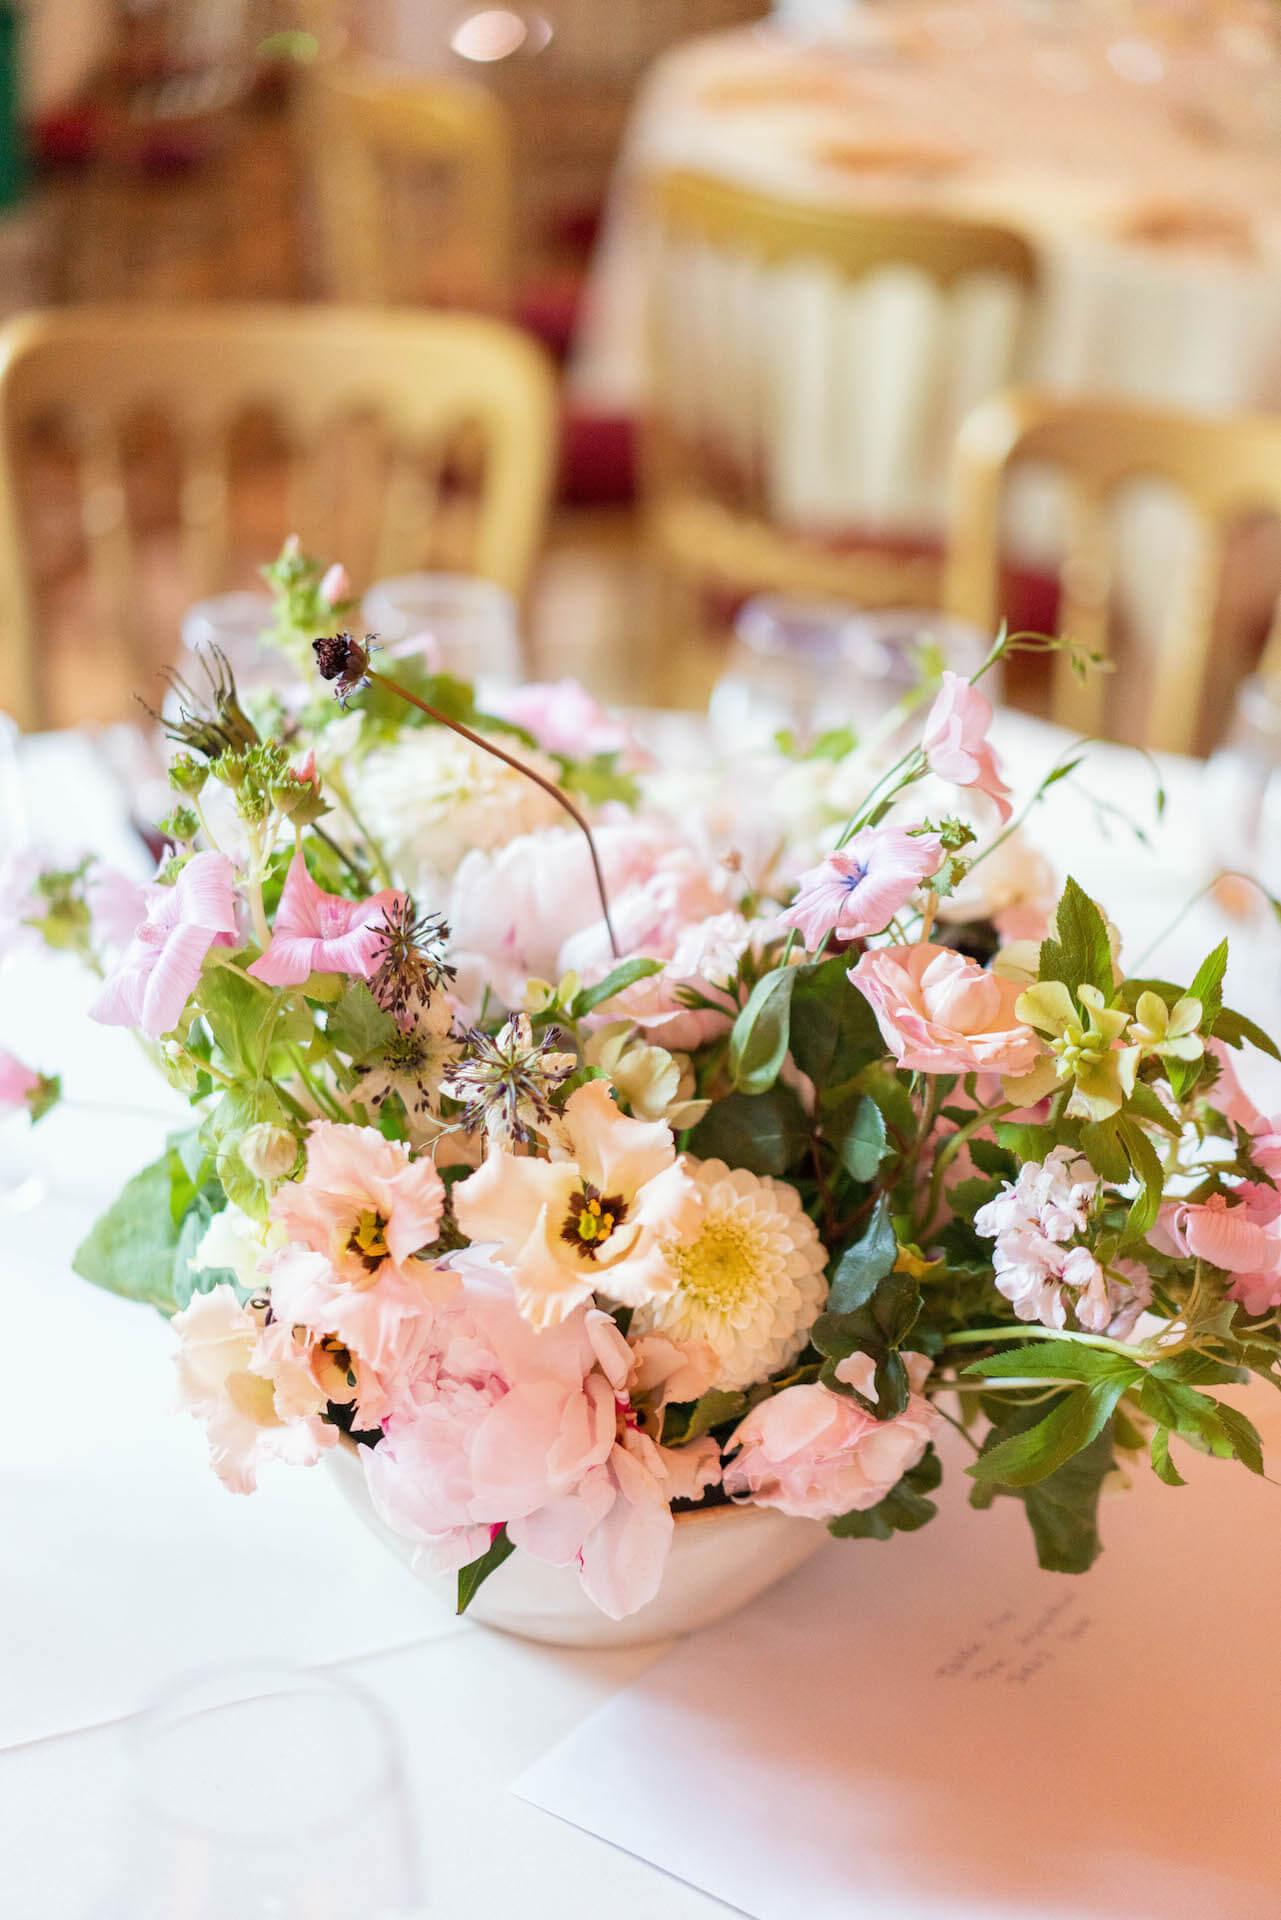 Light and Organic Wedding Flowers Centrepiece